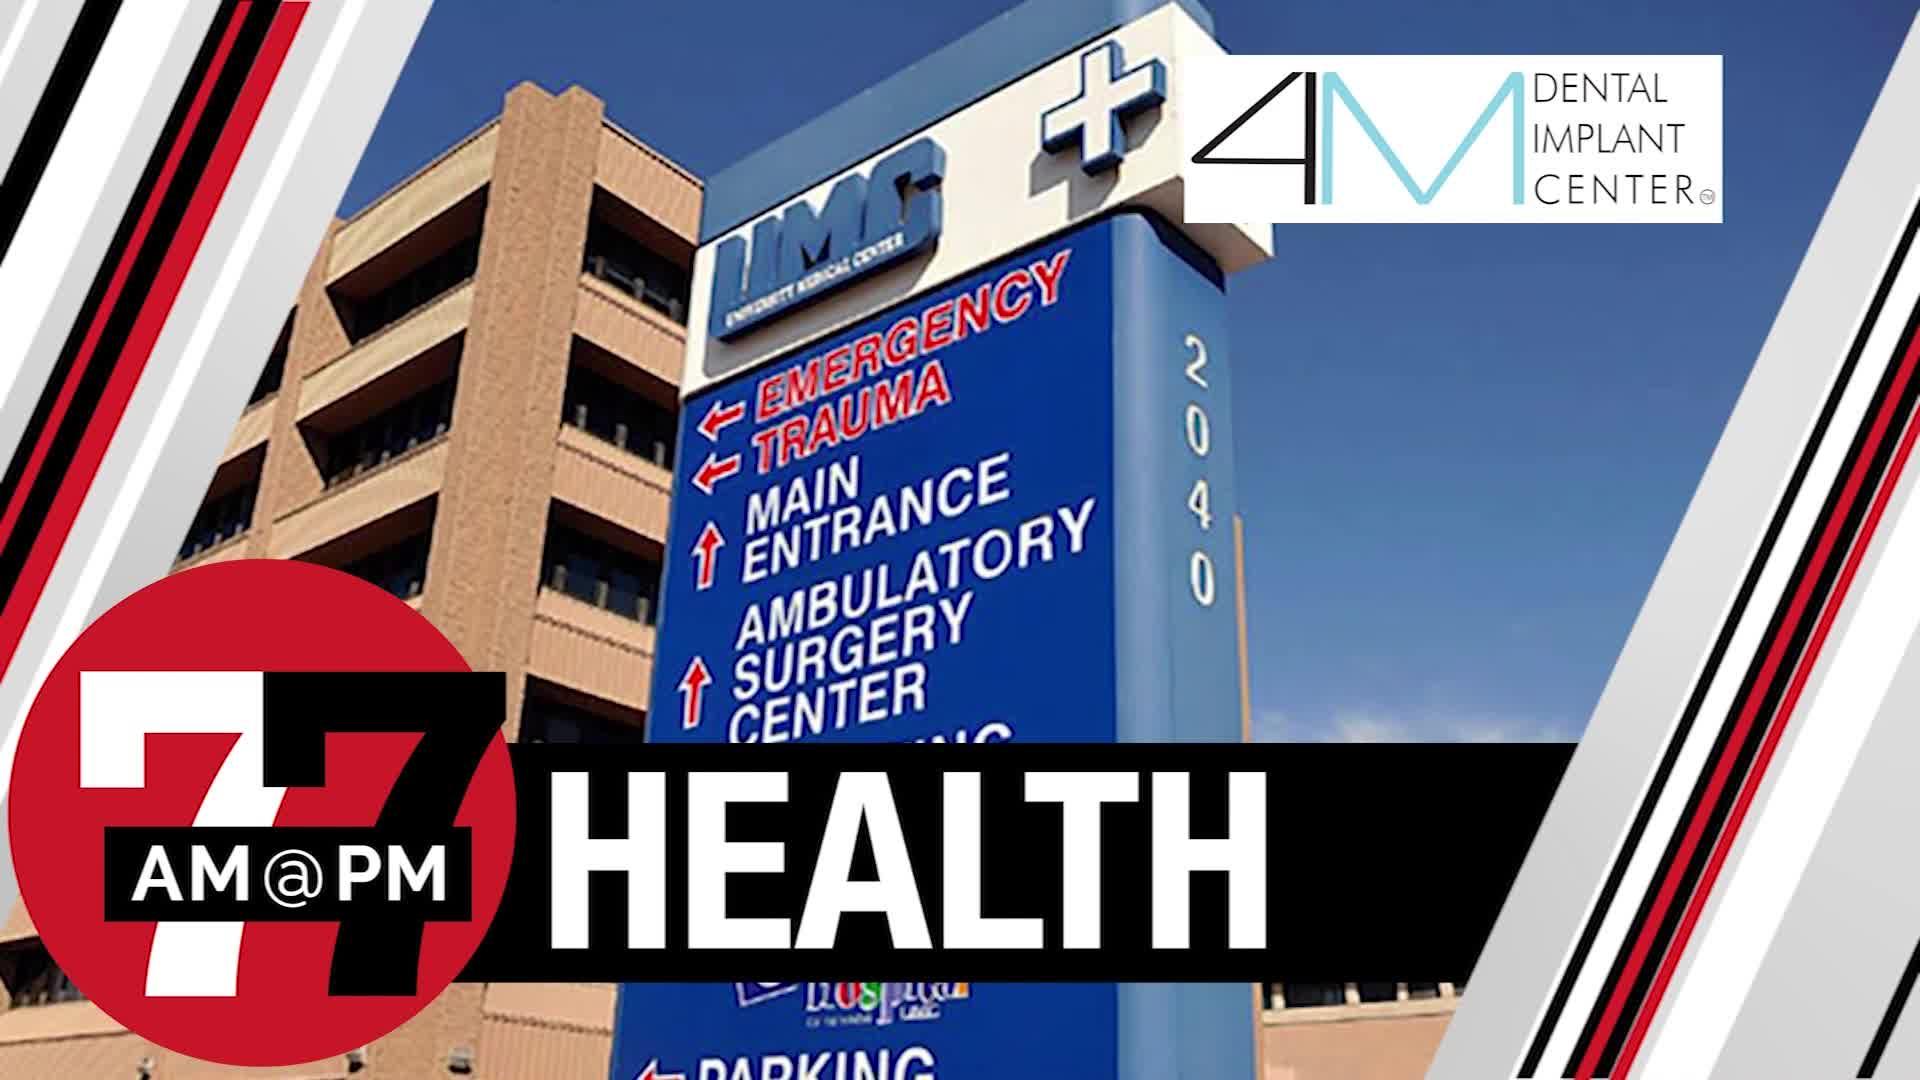 7@7PM UMC New HIV Testing Program